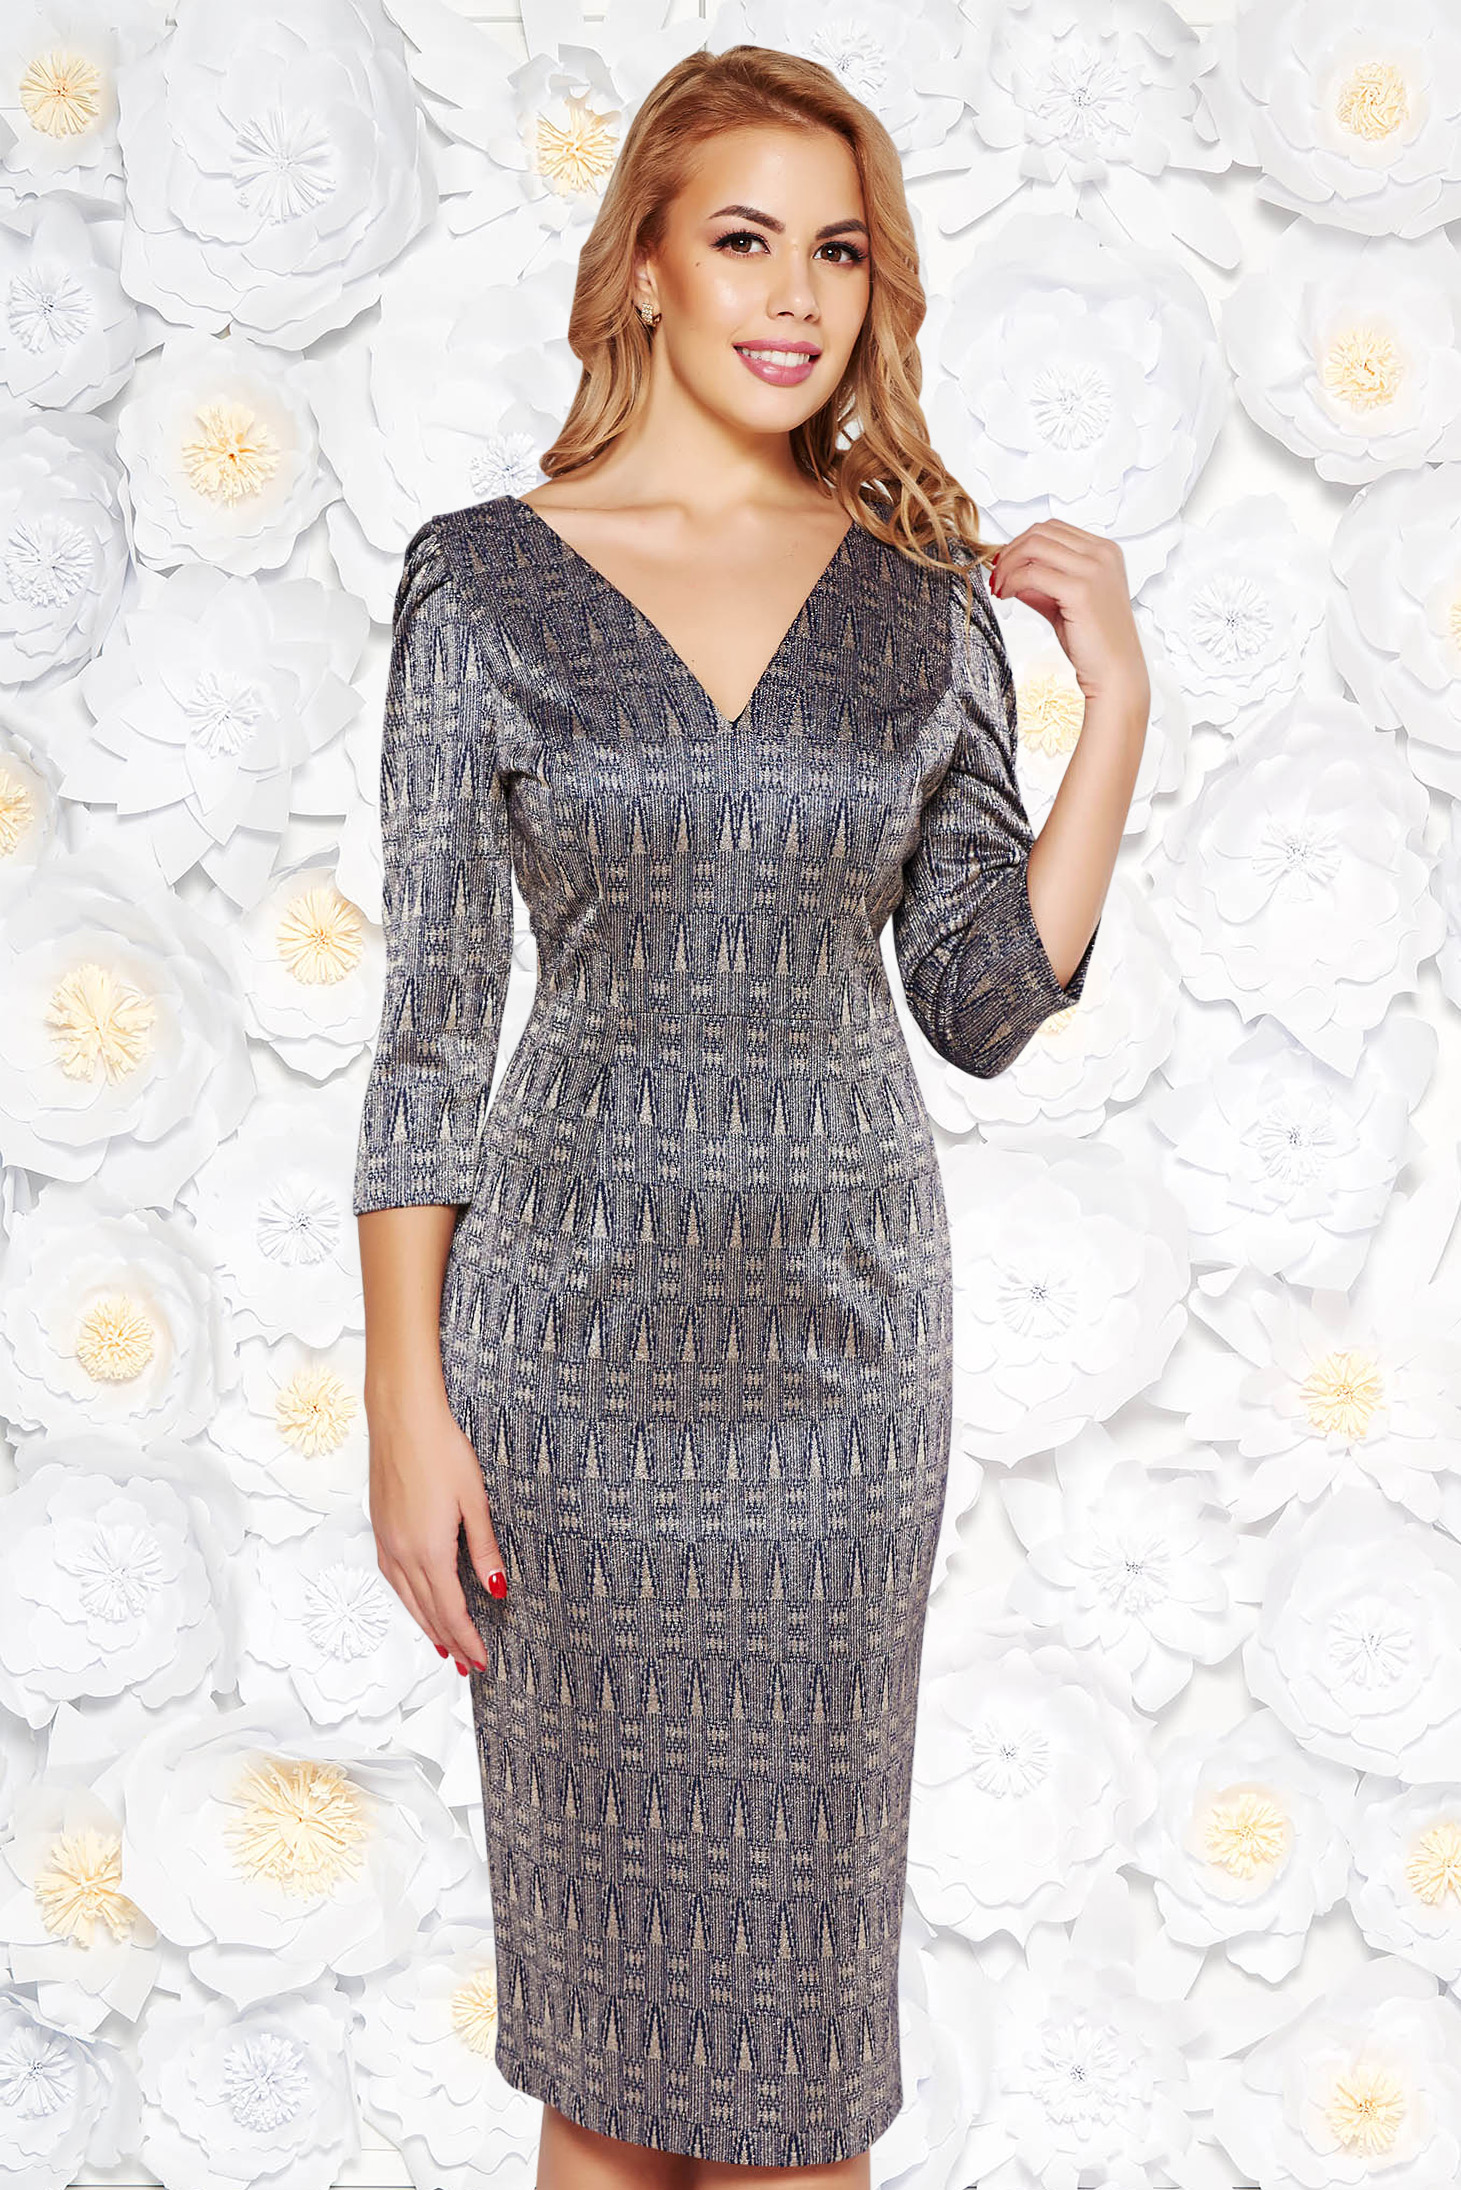 Darkblue pencil dress slightly elastic fabric with inside lining with v-neckline